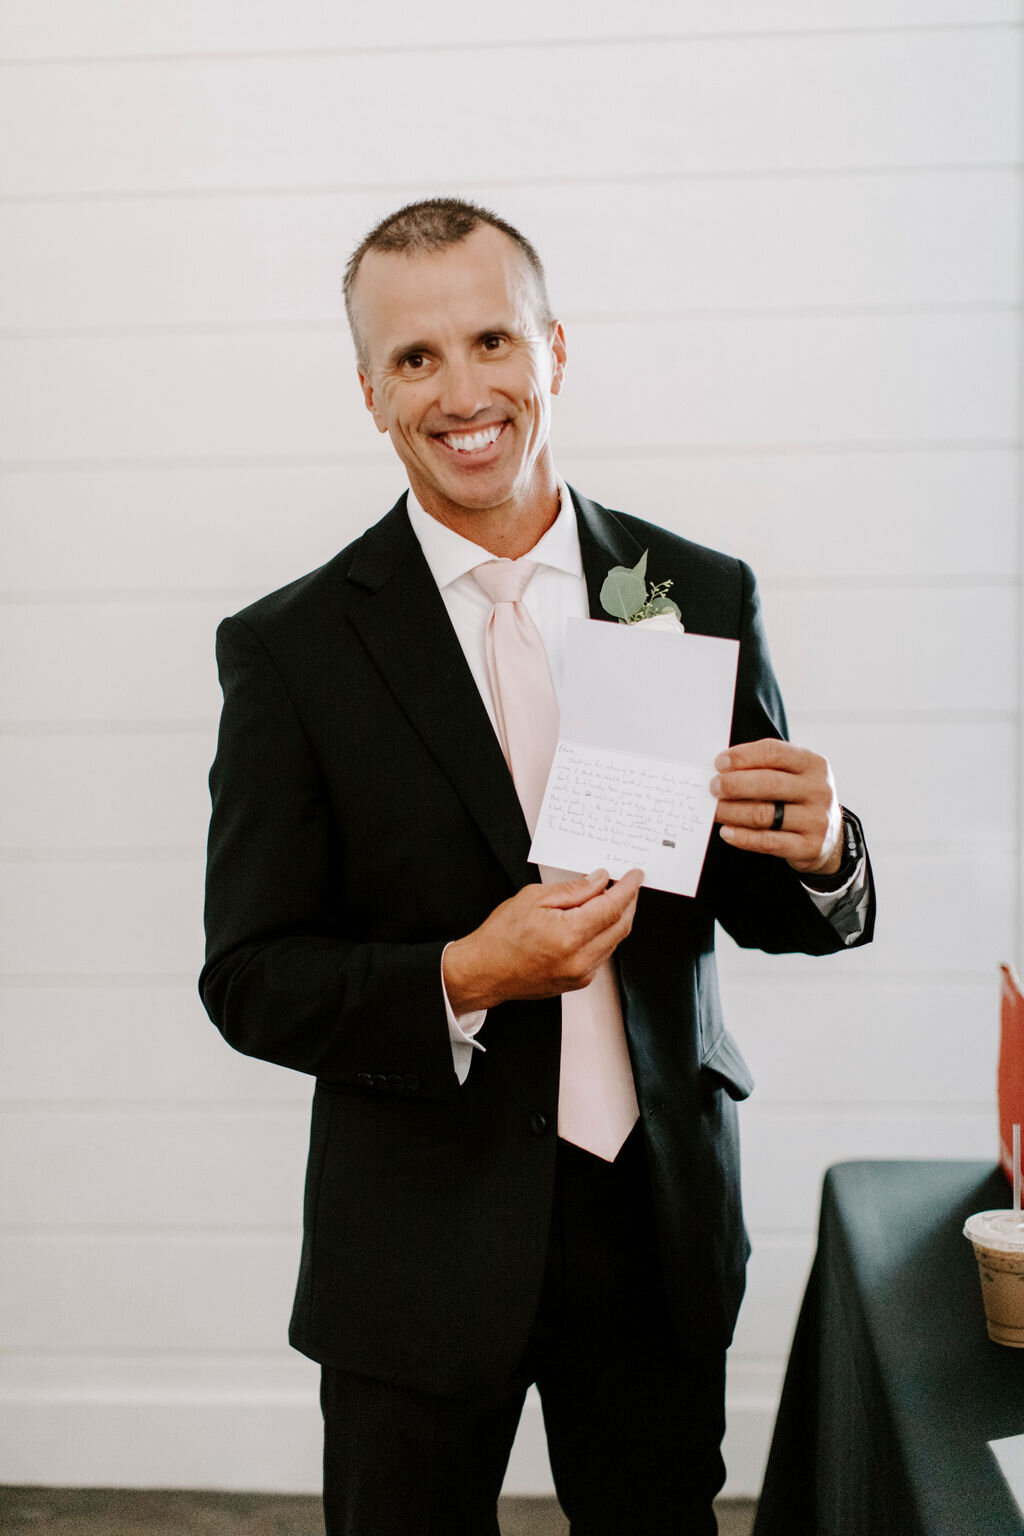 Tulsa White Barn Wedding Venue Outdoor Ceremony 60.jpg